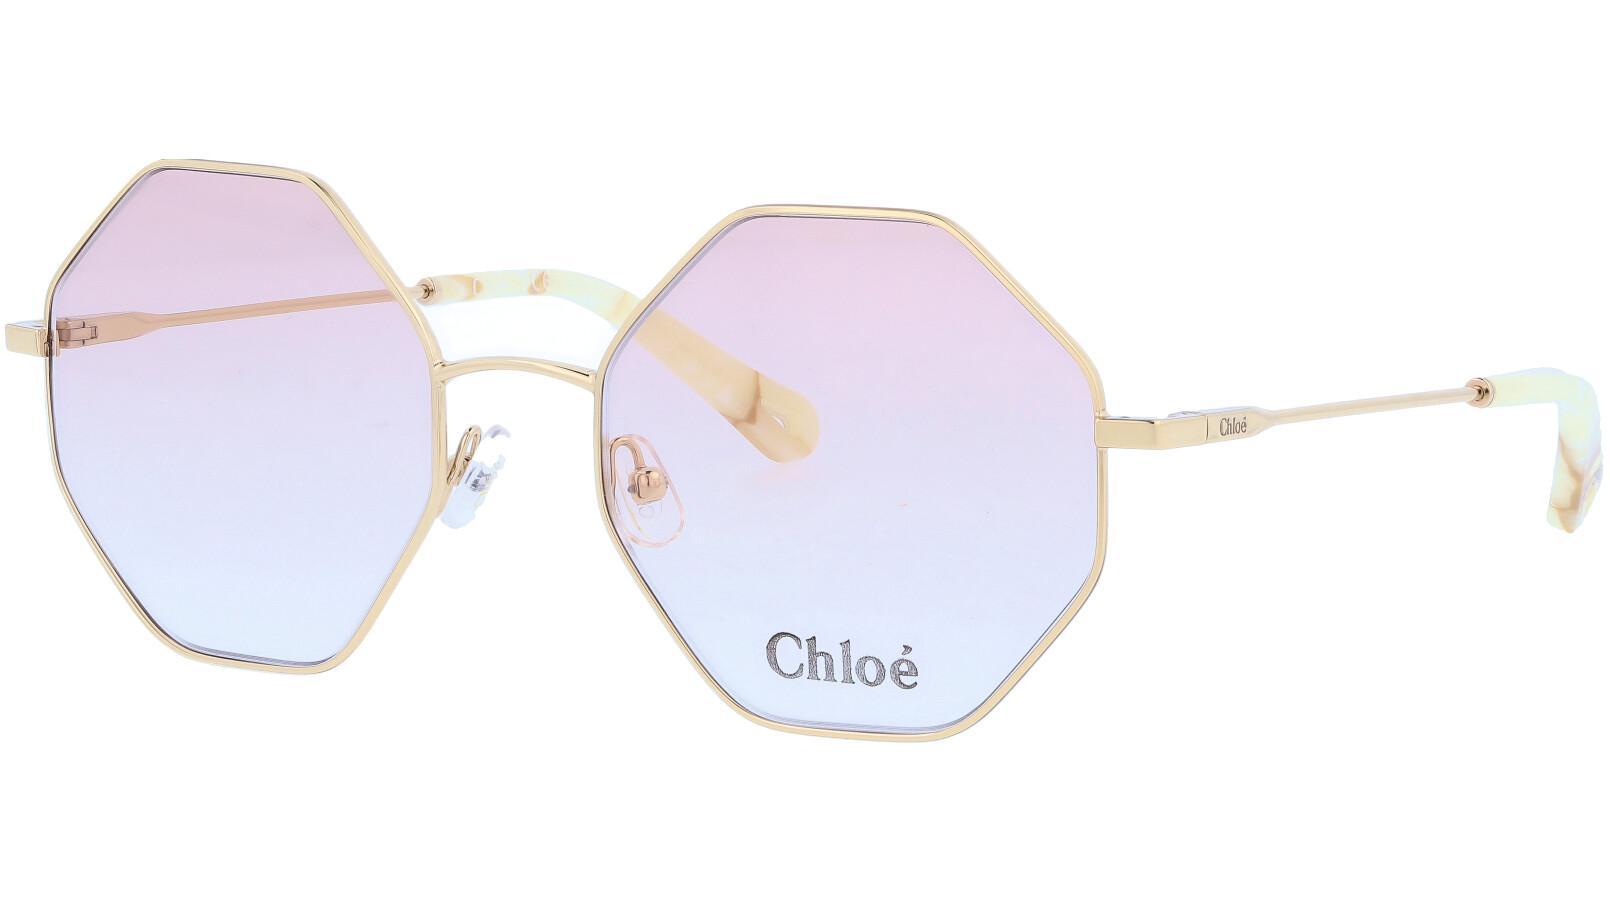 Chloé CE2134 717 55 Gold Octagonal Sunglasses